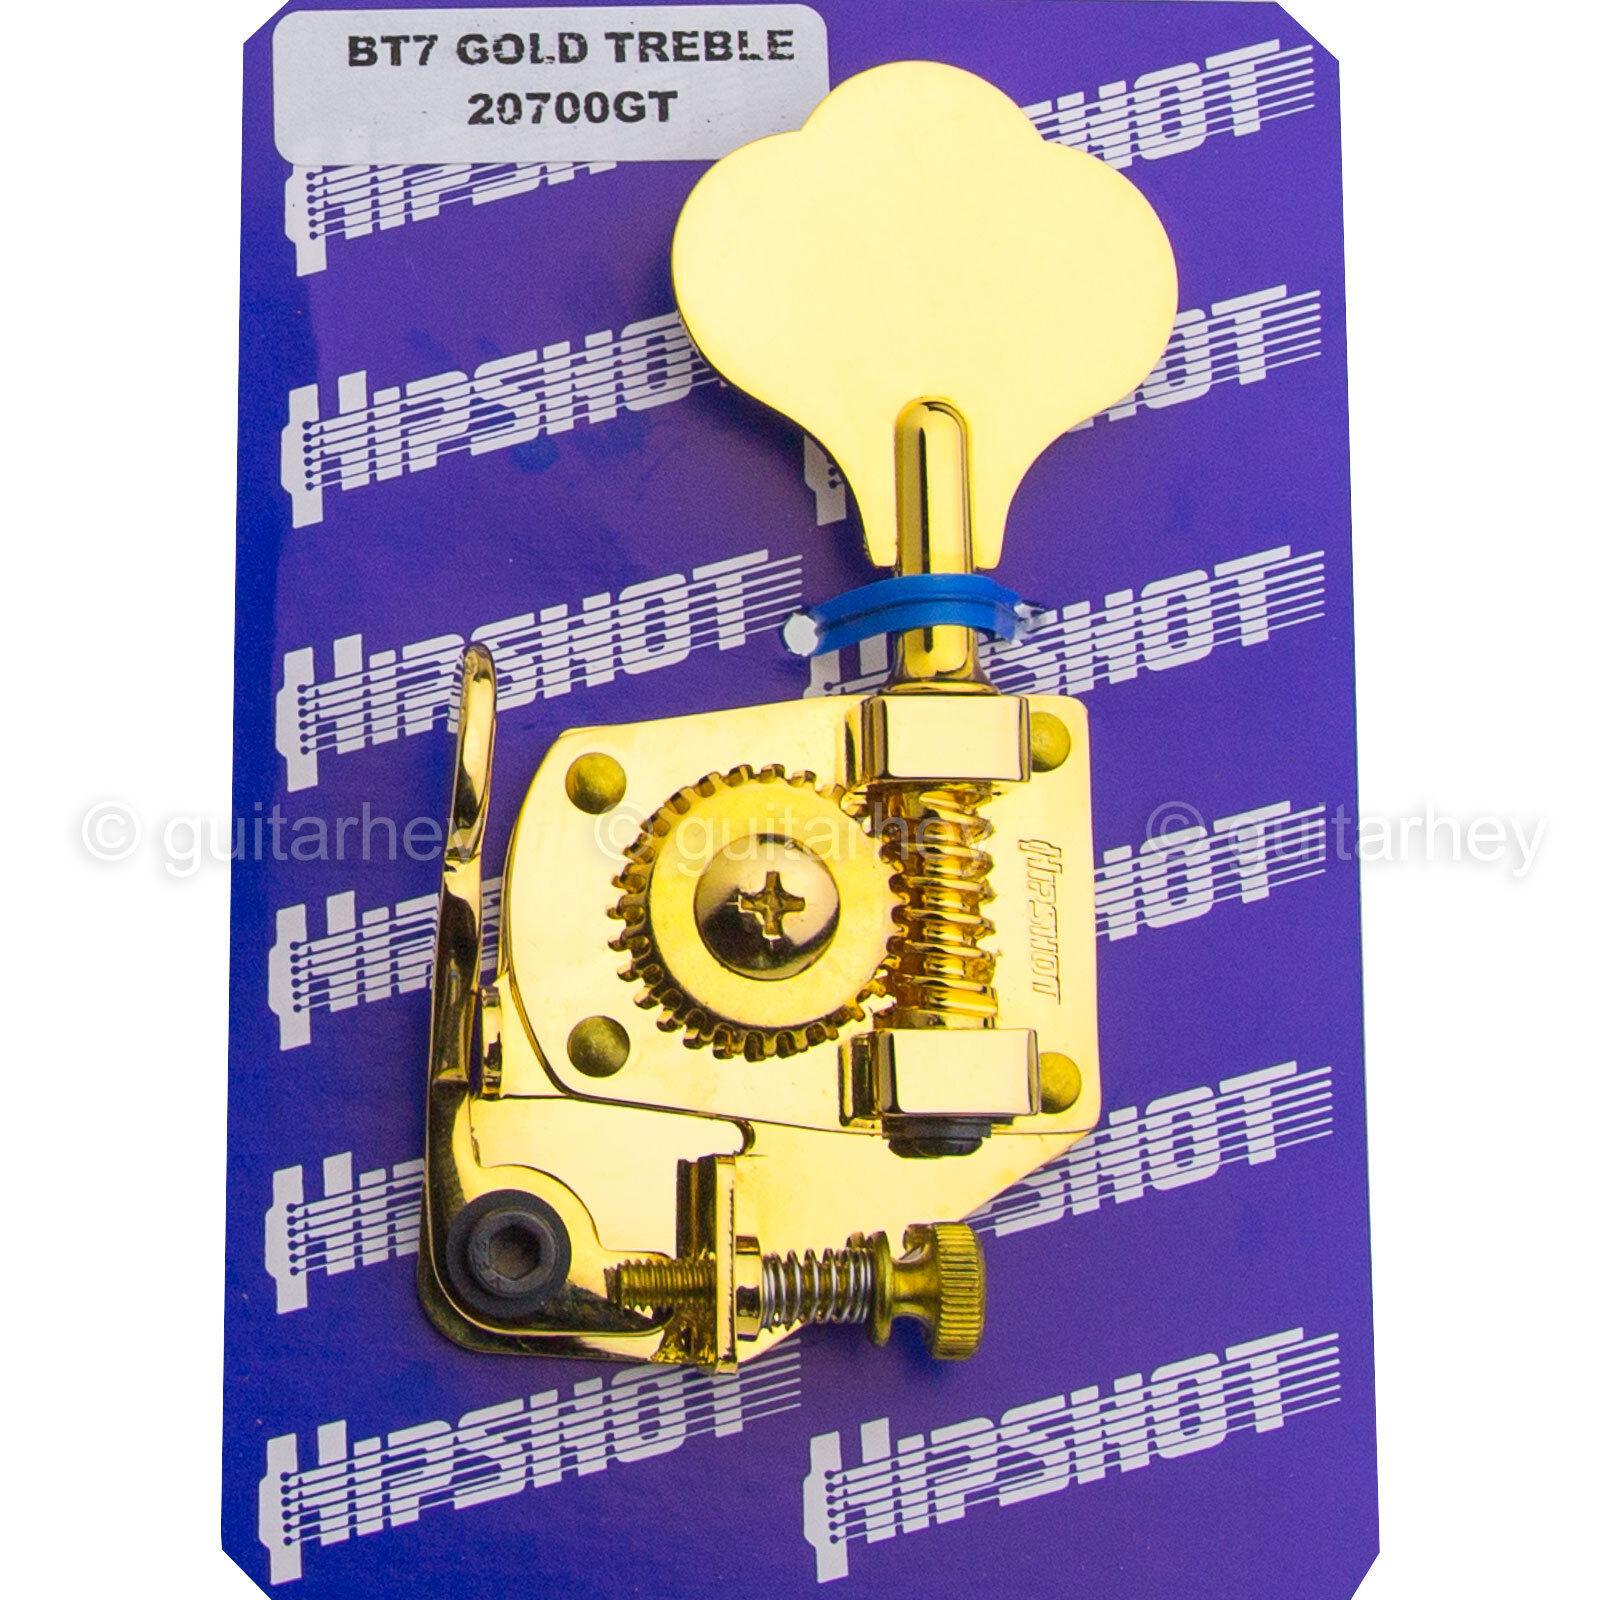 NEW Hipshot BT7 Bass Xtender Key TREBLE SIDE MIM Fender Extender Detuner - GOLD